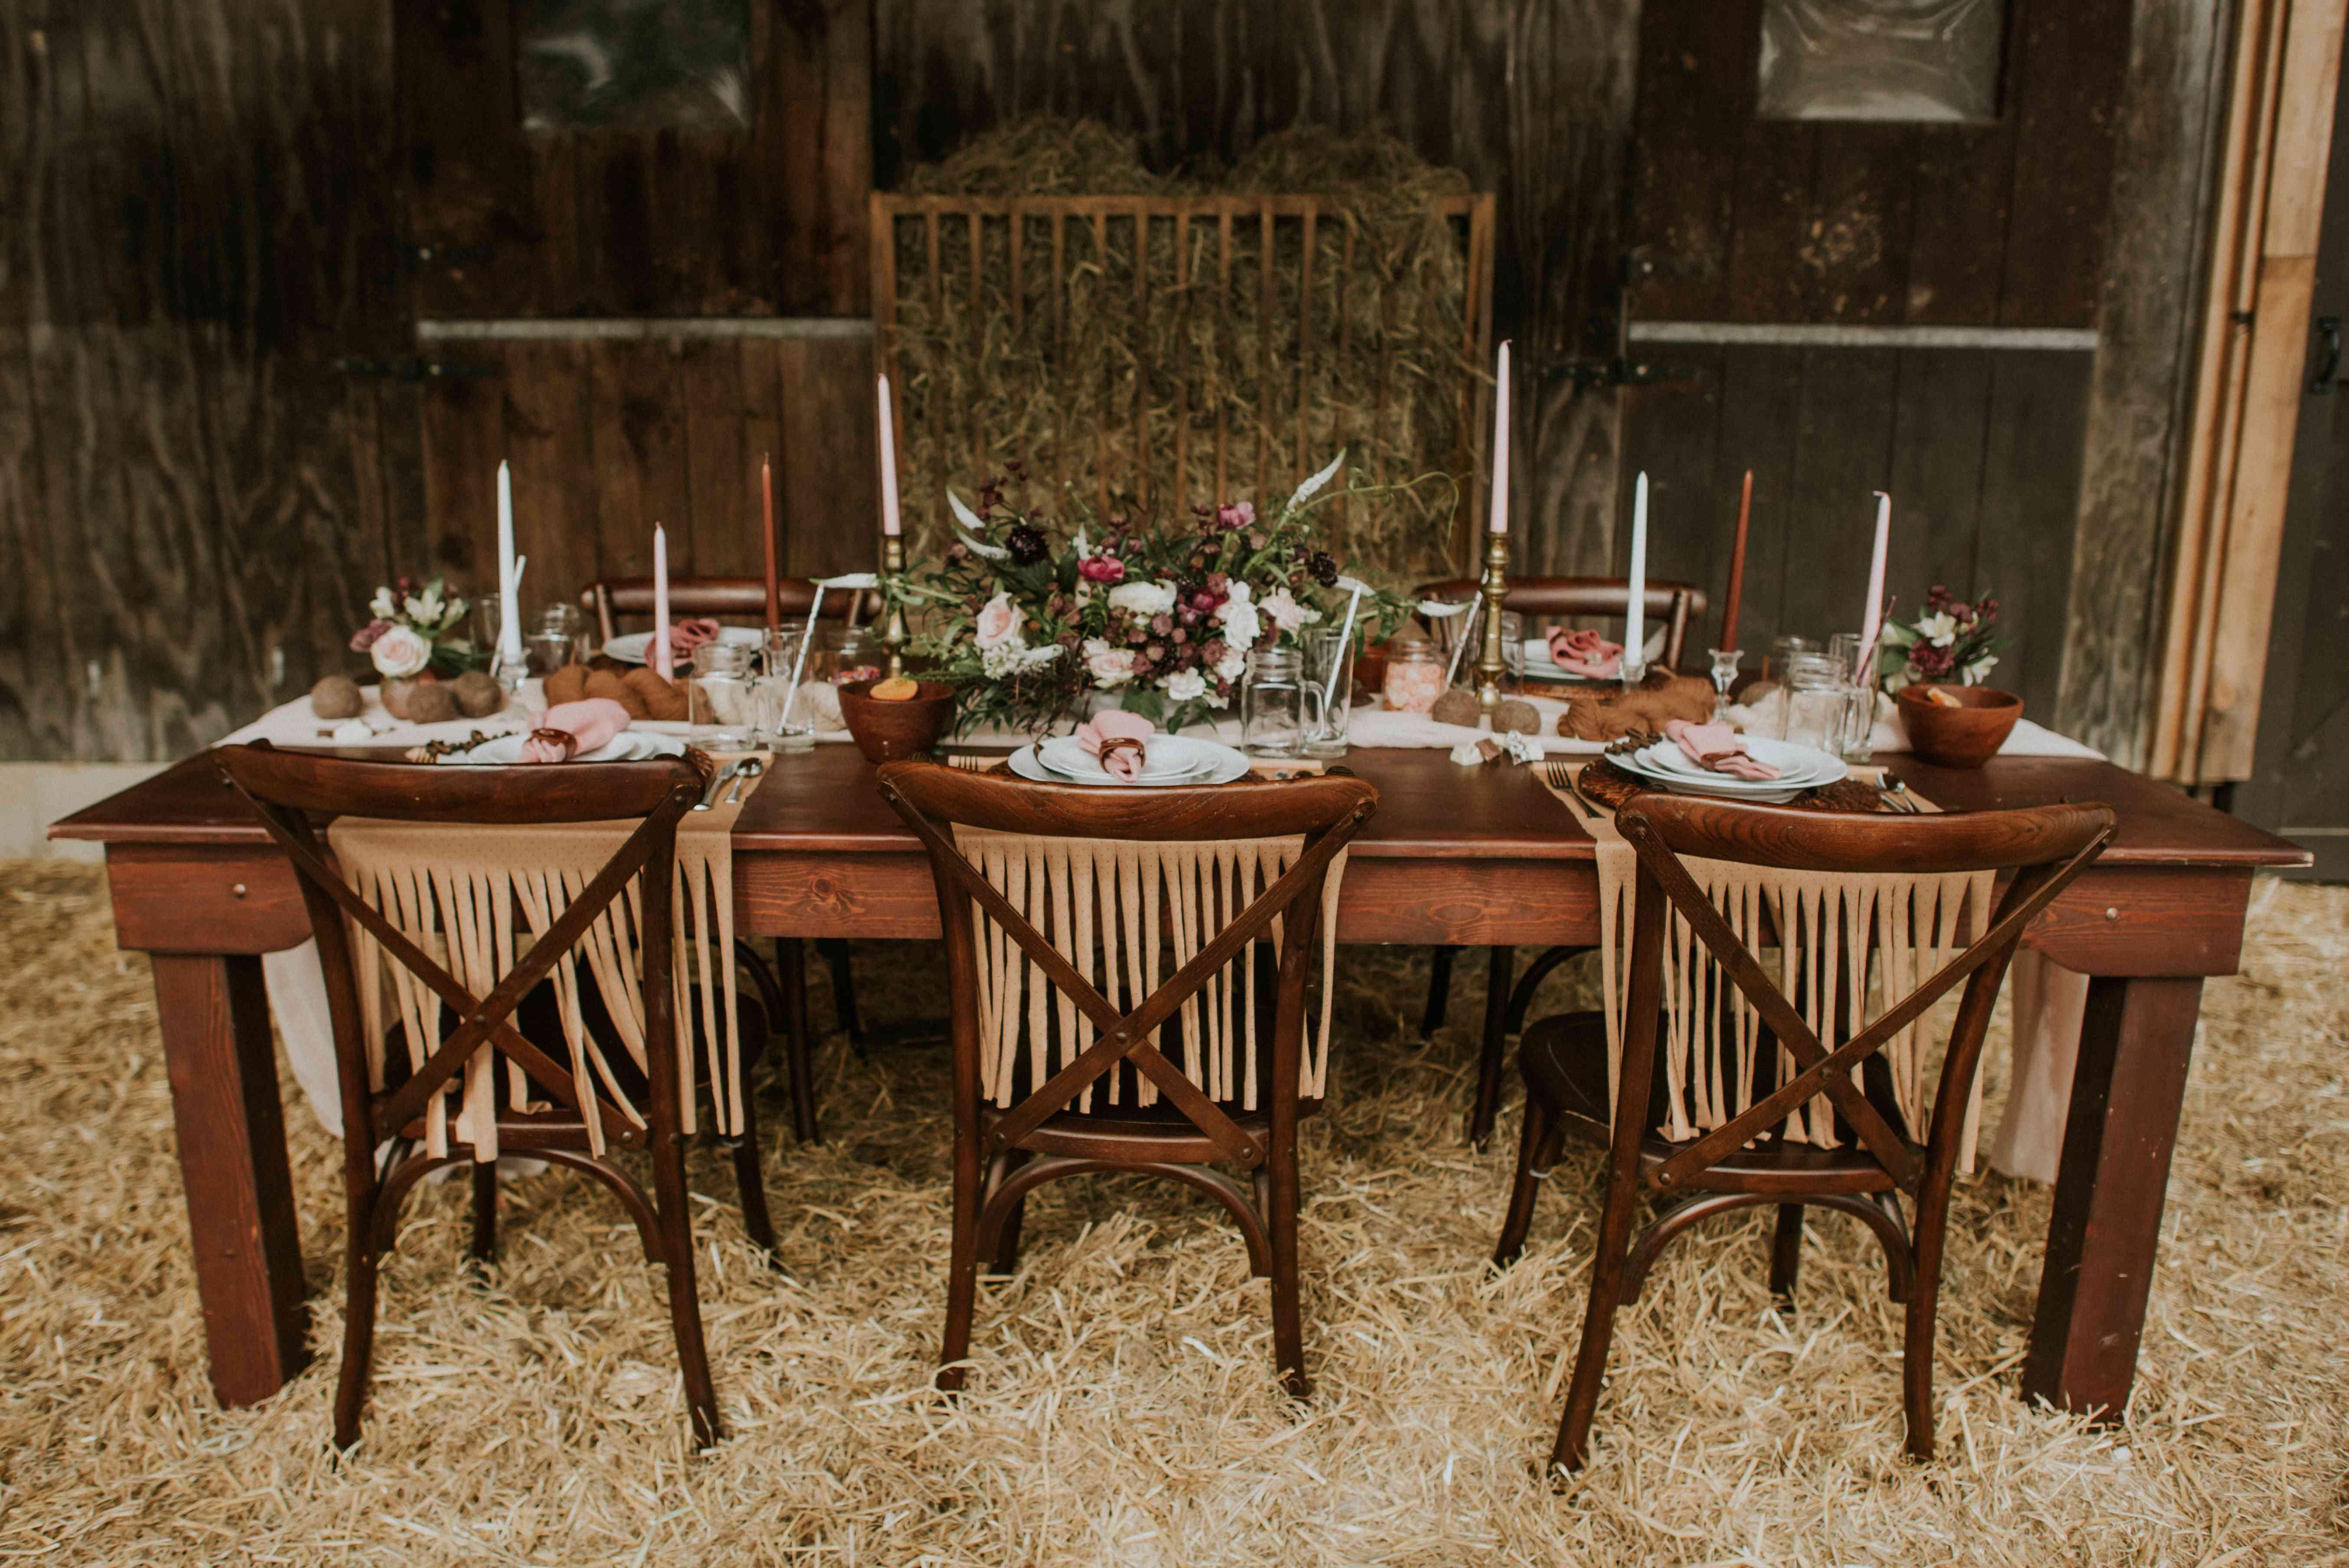 Barn inspired table setting